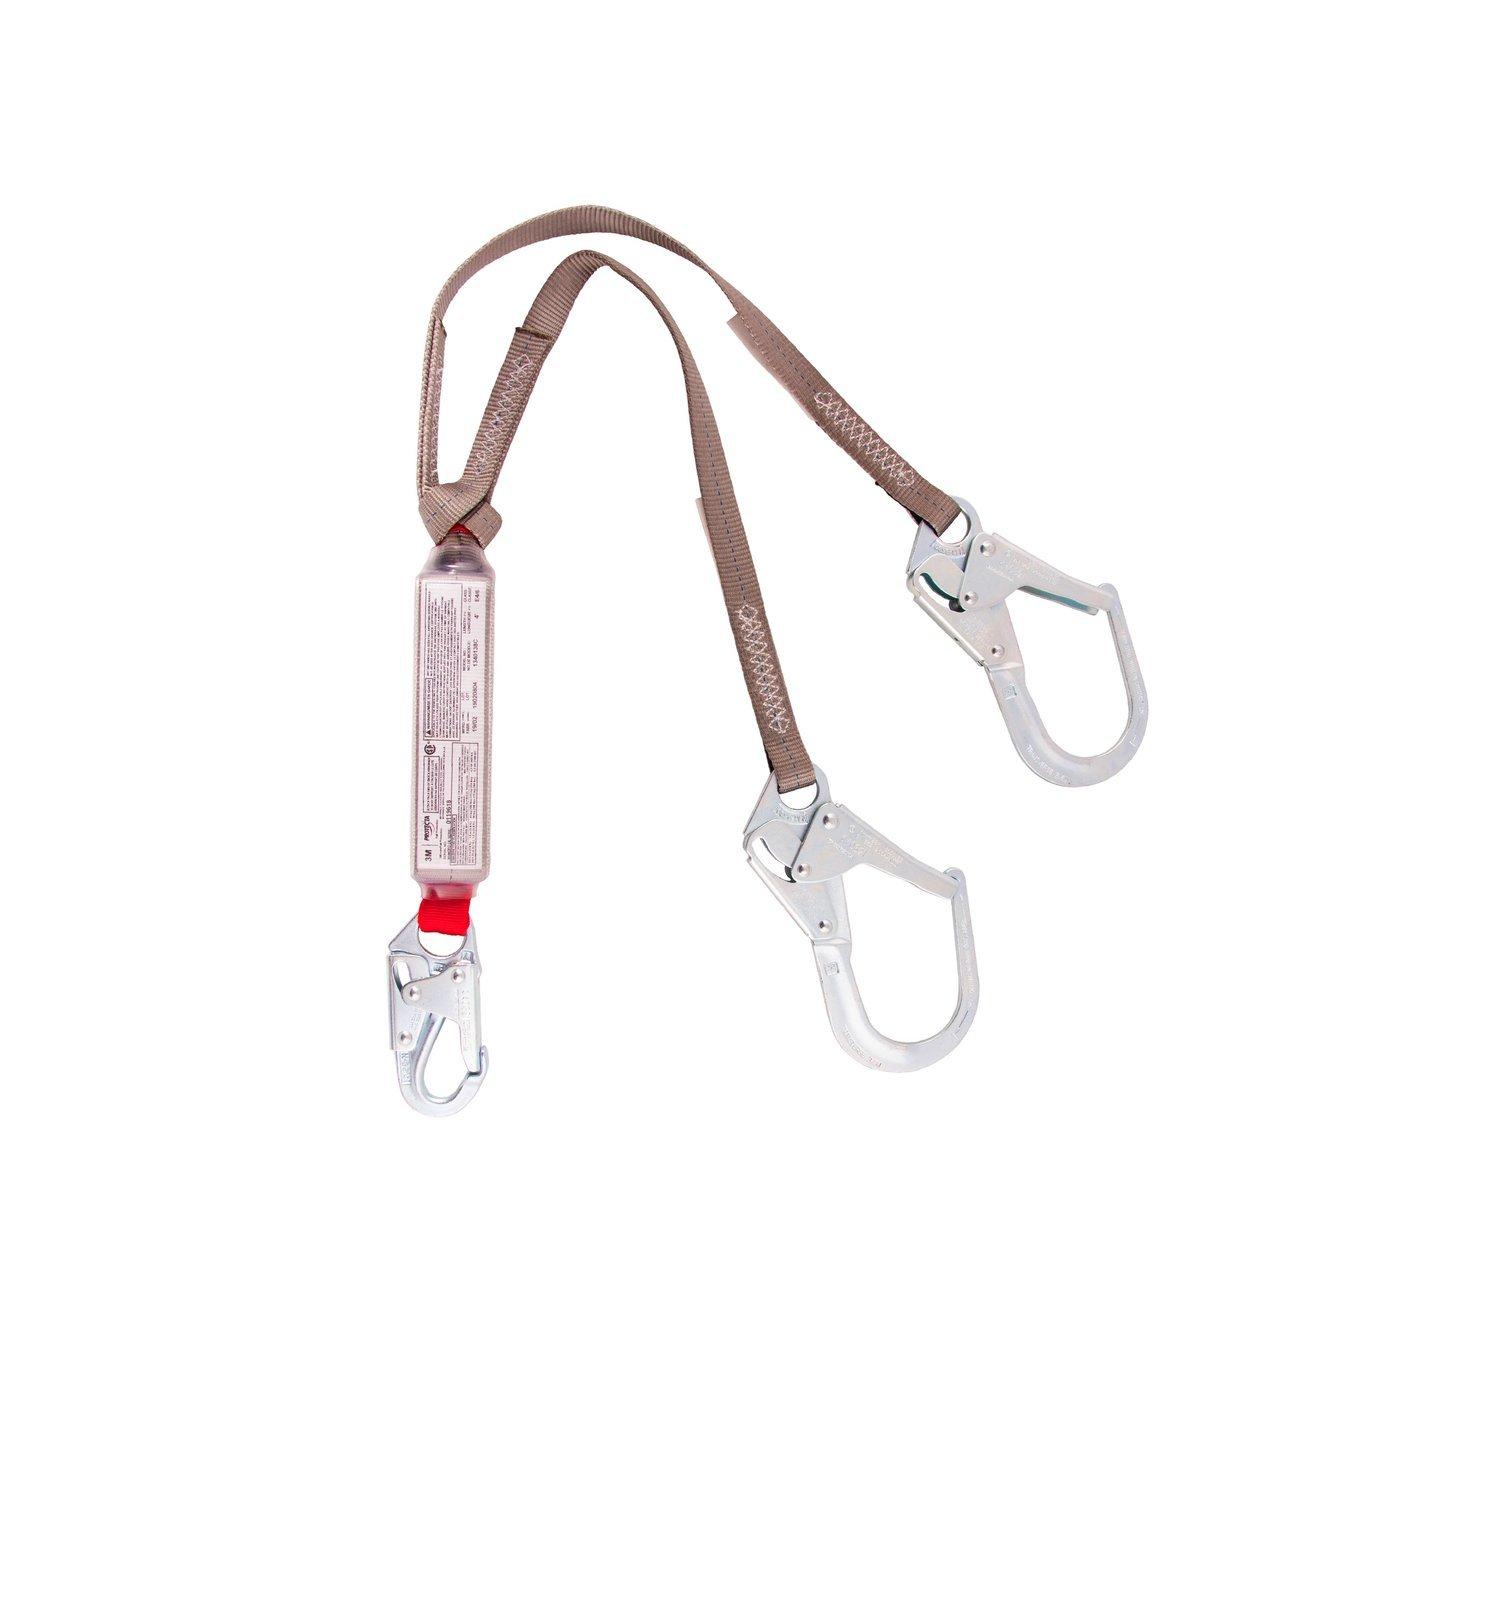 Protecta Y-lanyard w/ Scaffolding Hook, E4 / E6 Combo Absorber